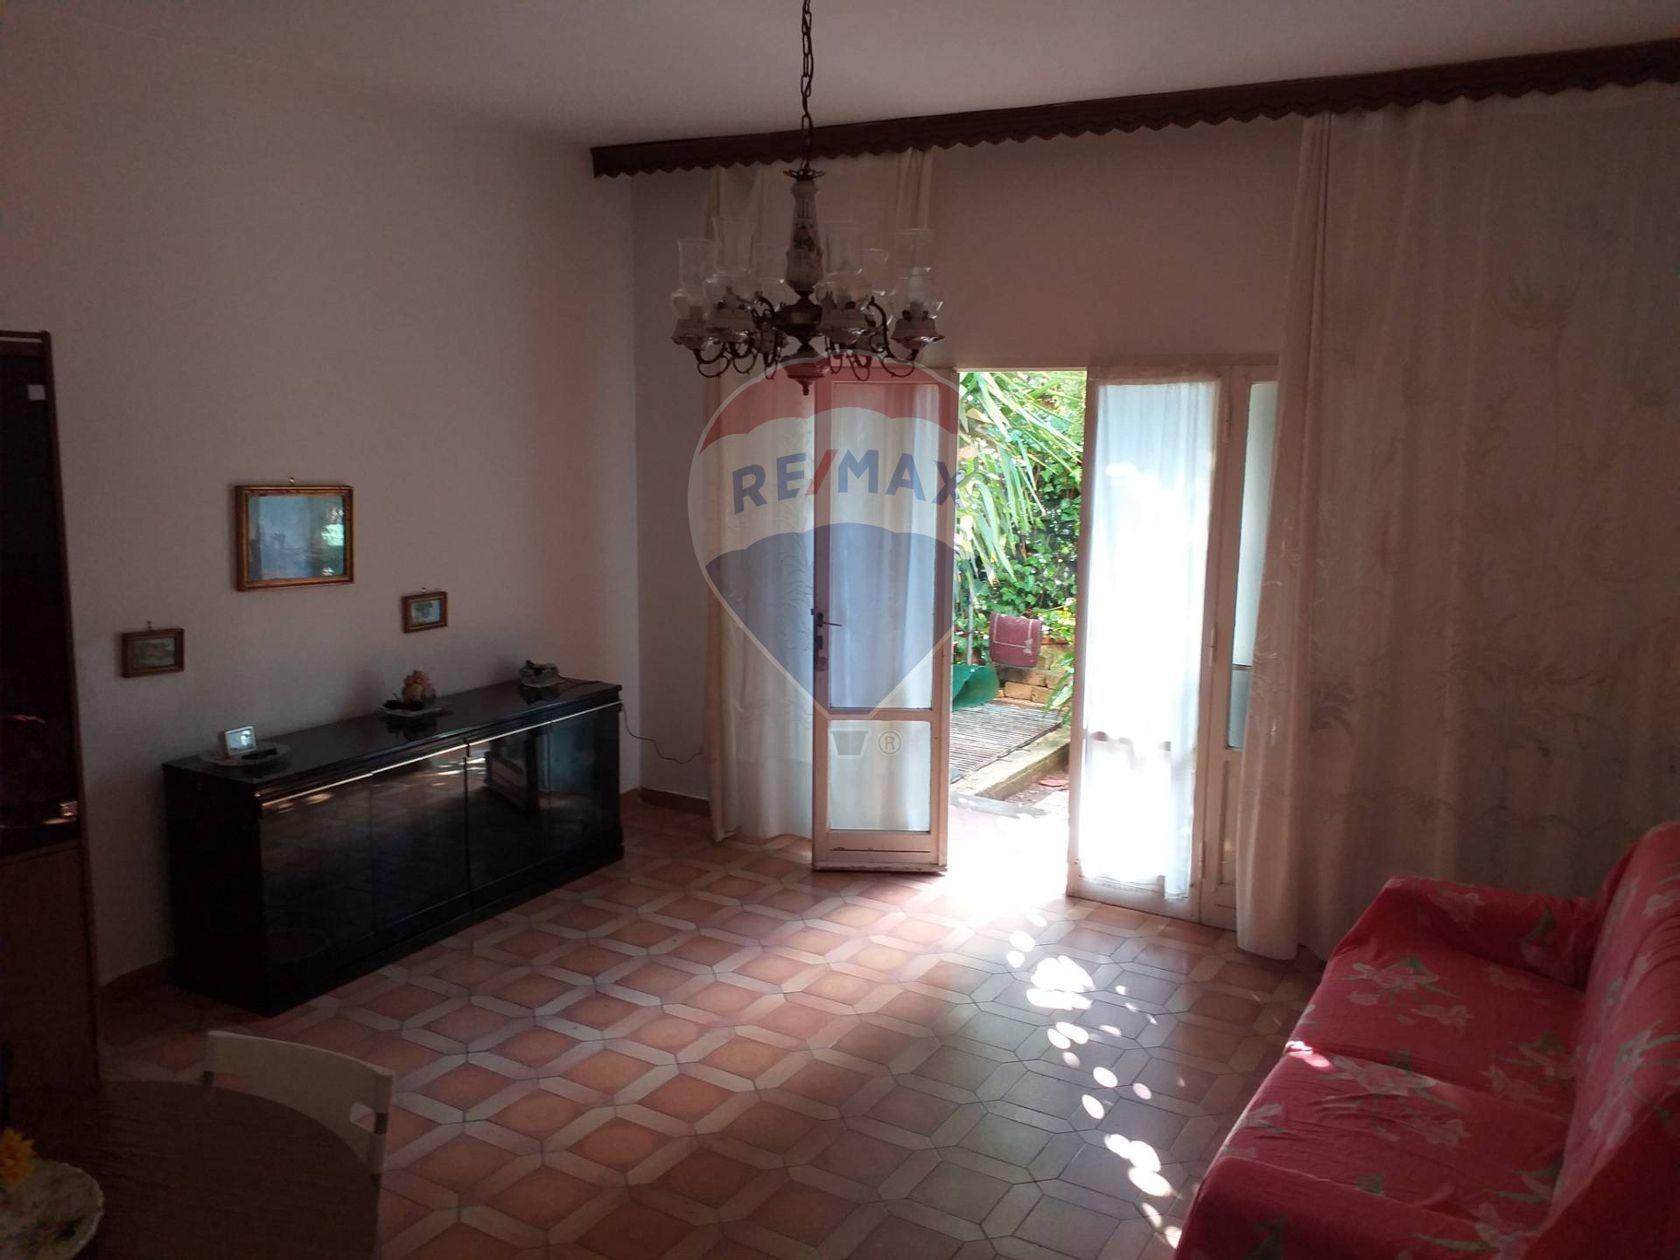 Villa a schiera Torre a Mare, Bari, BA Vendita - Foto 9